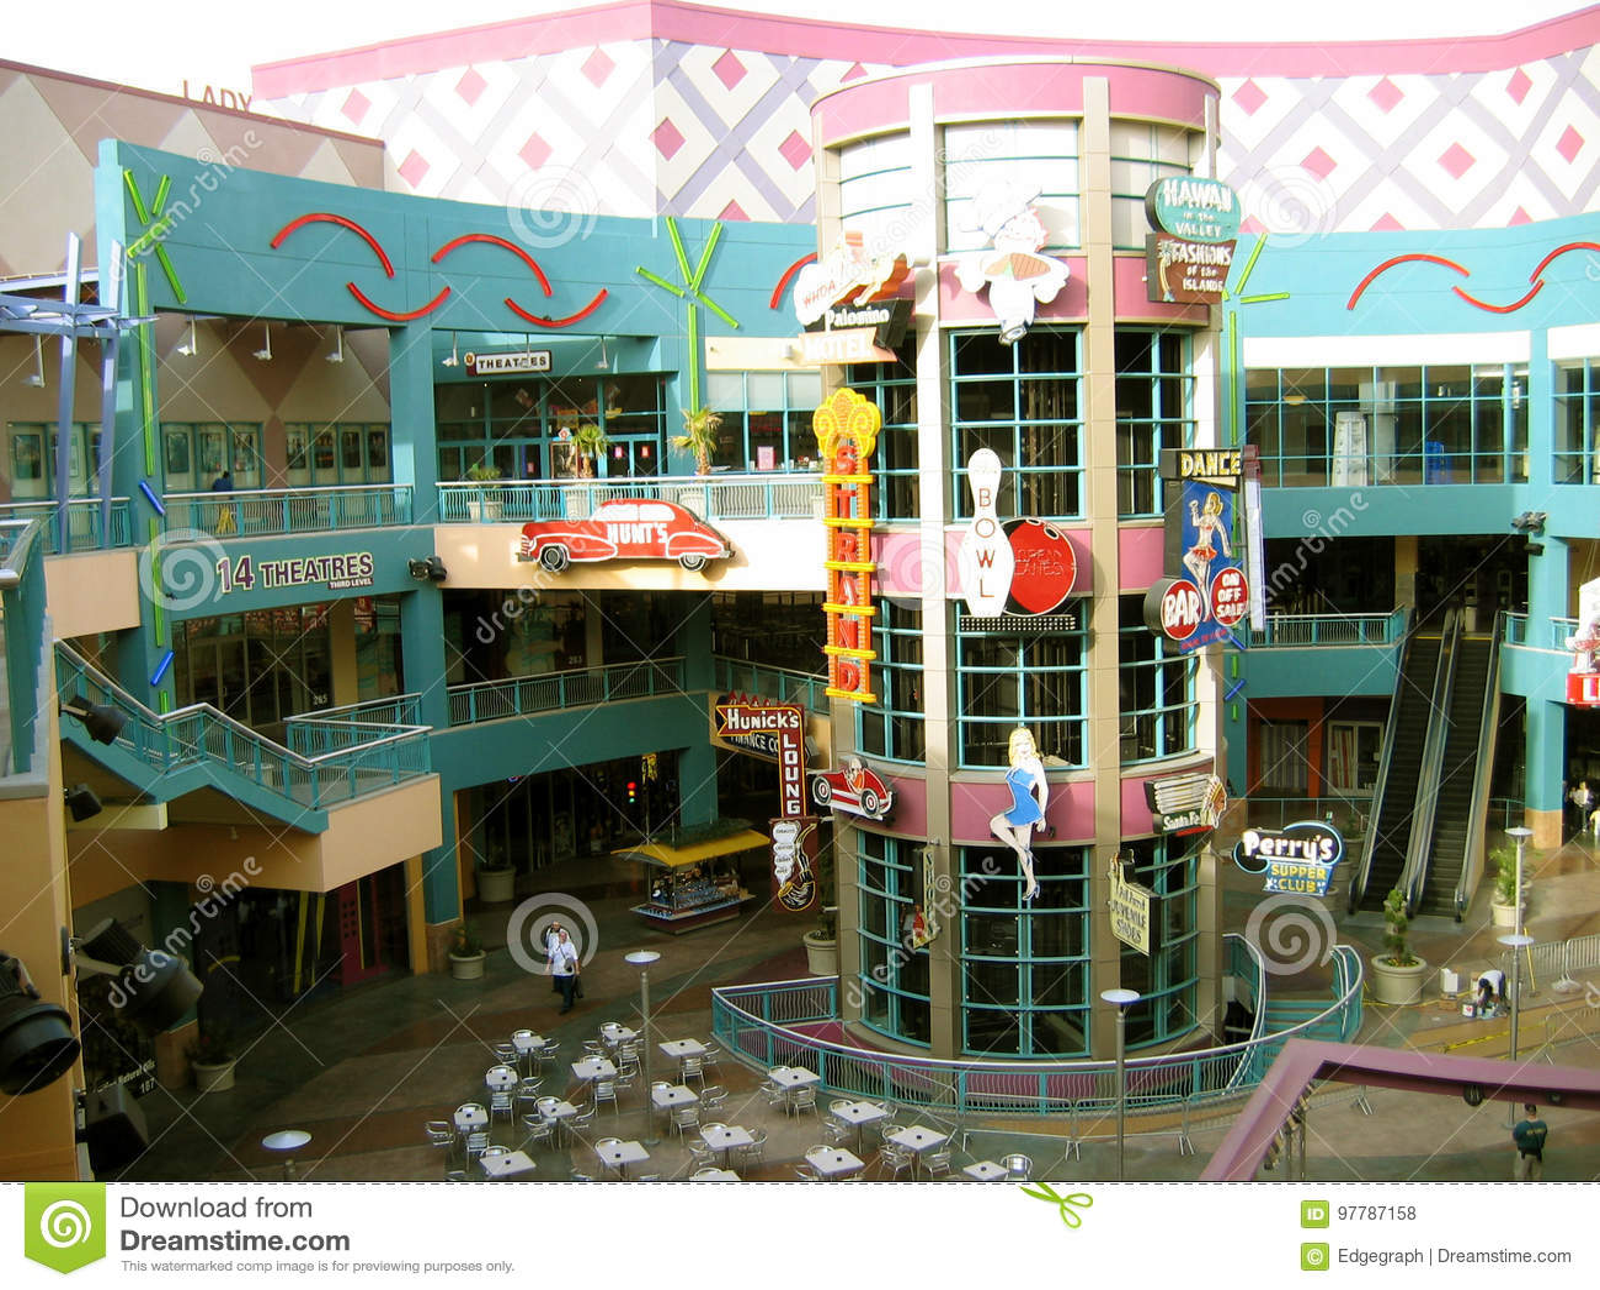 Neonopolis 14 théâtres, Las Vegas, Nevada, Etats-Unis